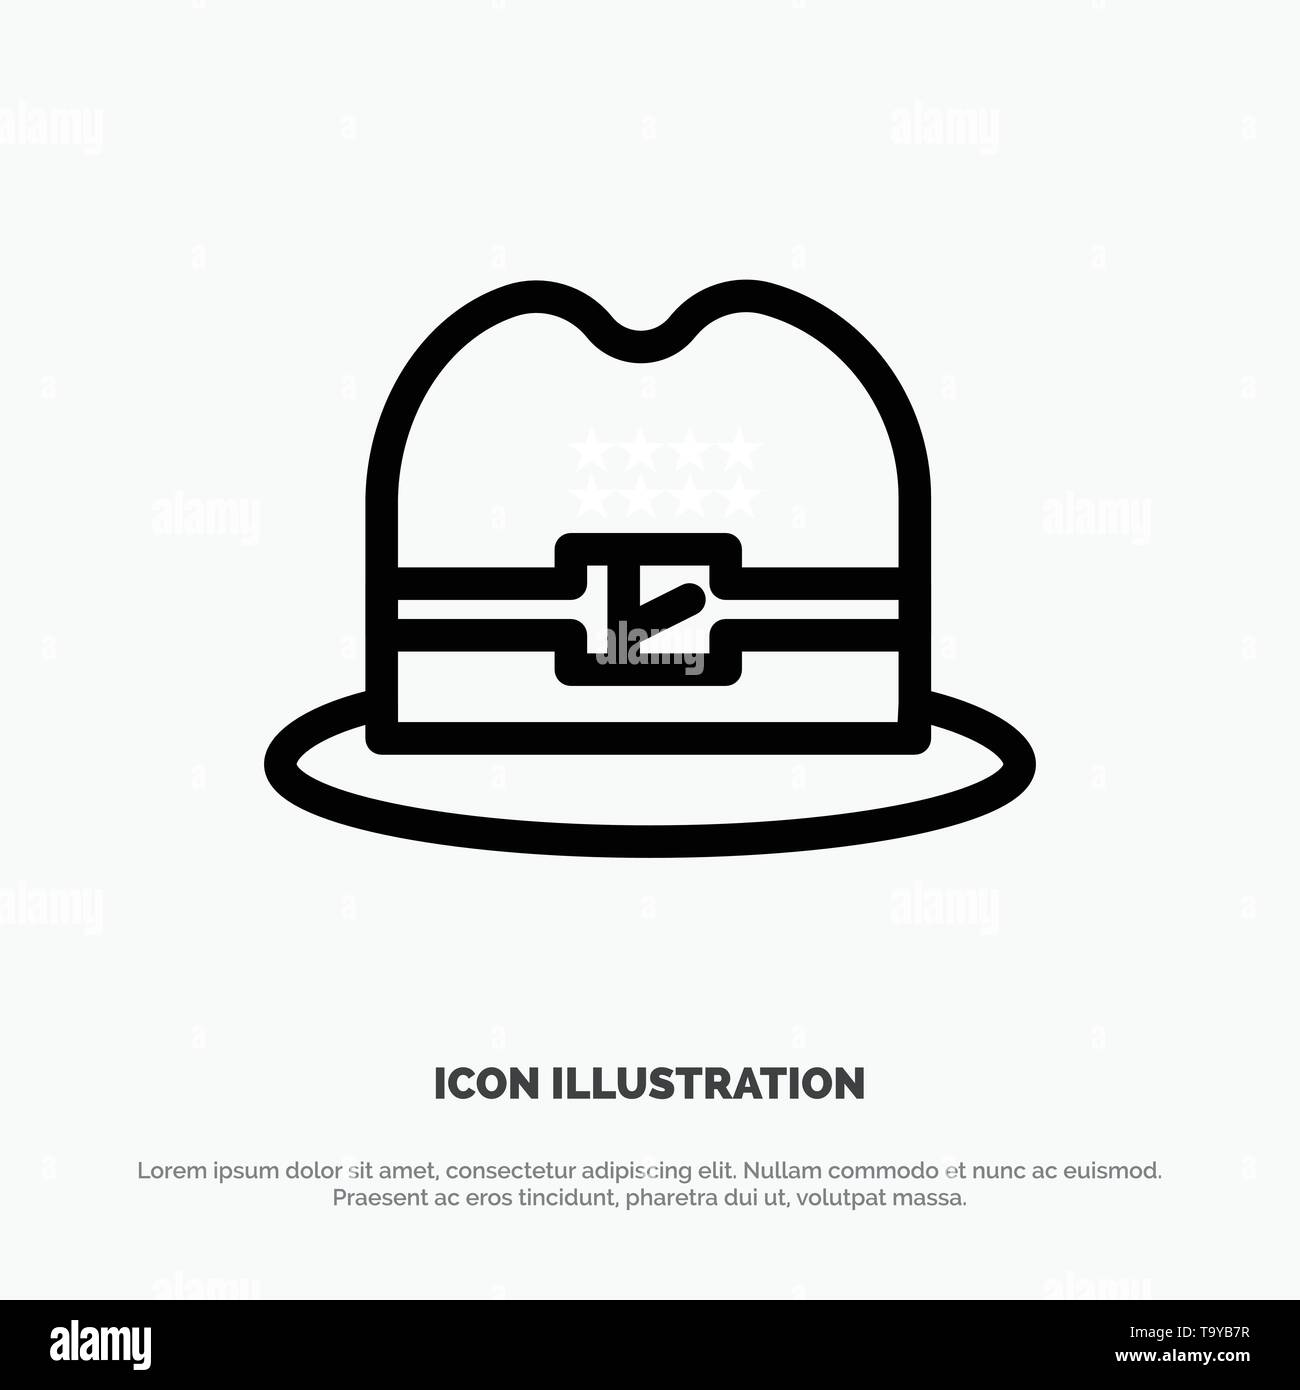 Hat, Cap, American Line Icon Vector - Stock Image